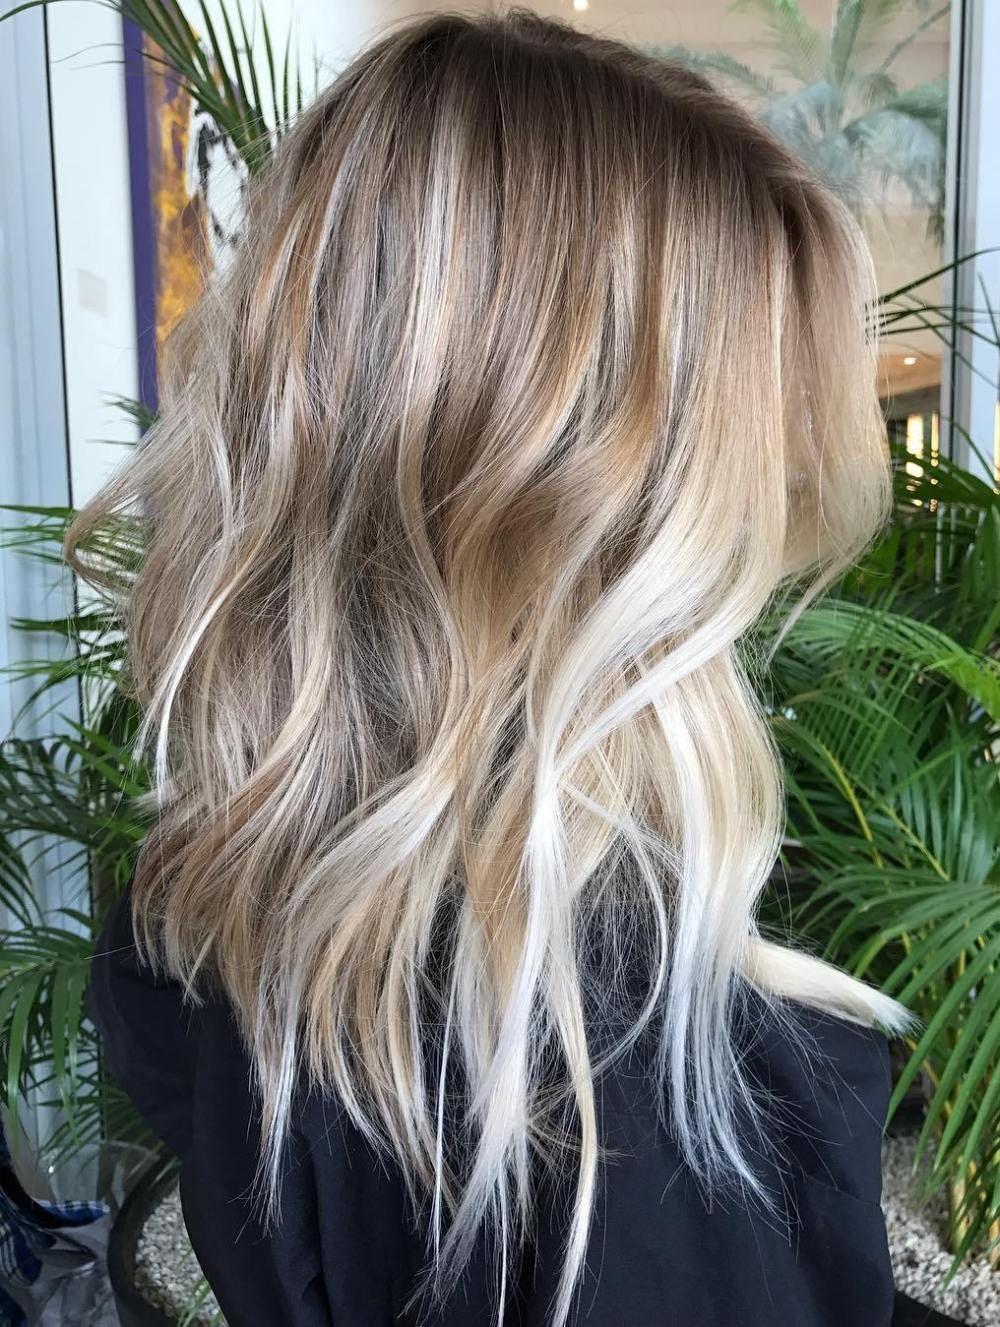 Mid-Length Layers with Balayage #Balayage #balayage hair blonde